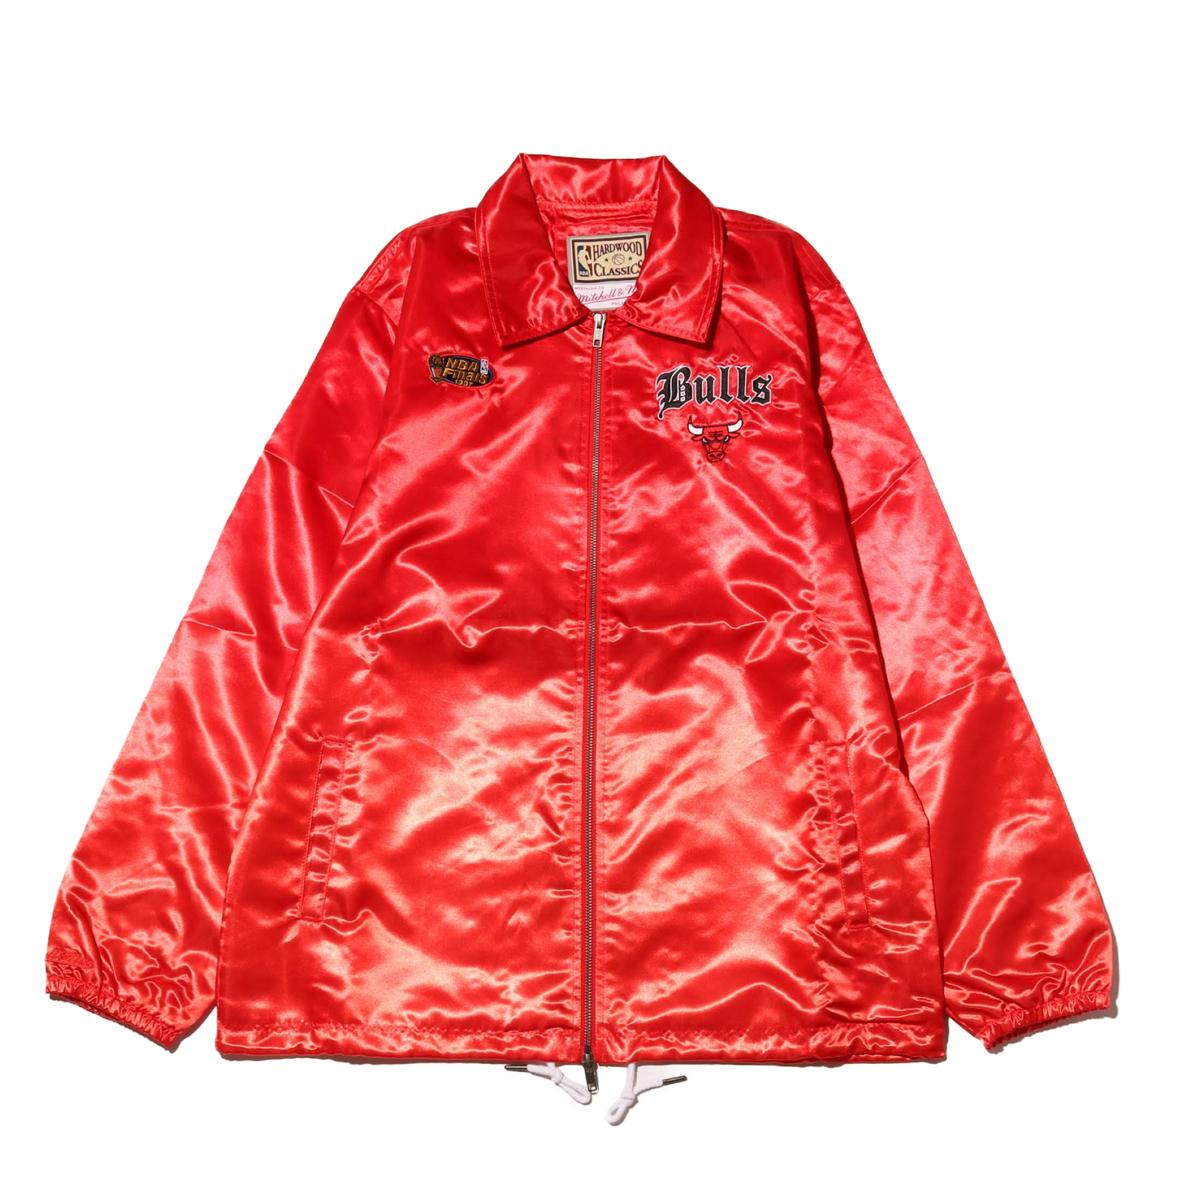 Mitchell & Ness Old English Satin Jacket CHI.Bulls(RED)(ミッチェルアンドネス オールドイングリッシュ ブルゾン/シカゴブルズ)【メンズ】【ジャケット】【19HO-I】